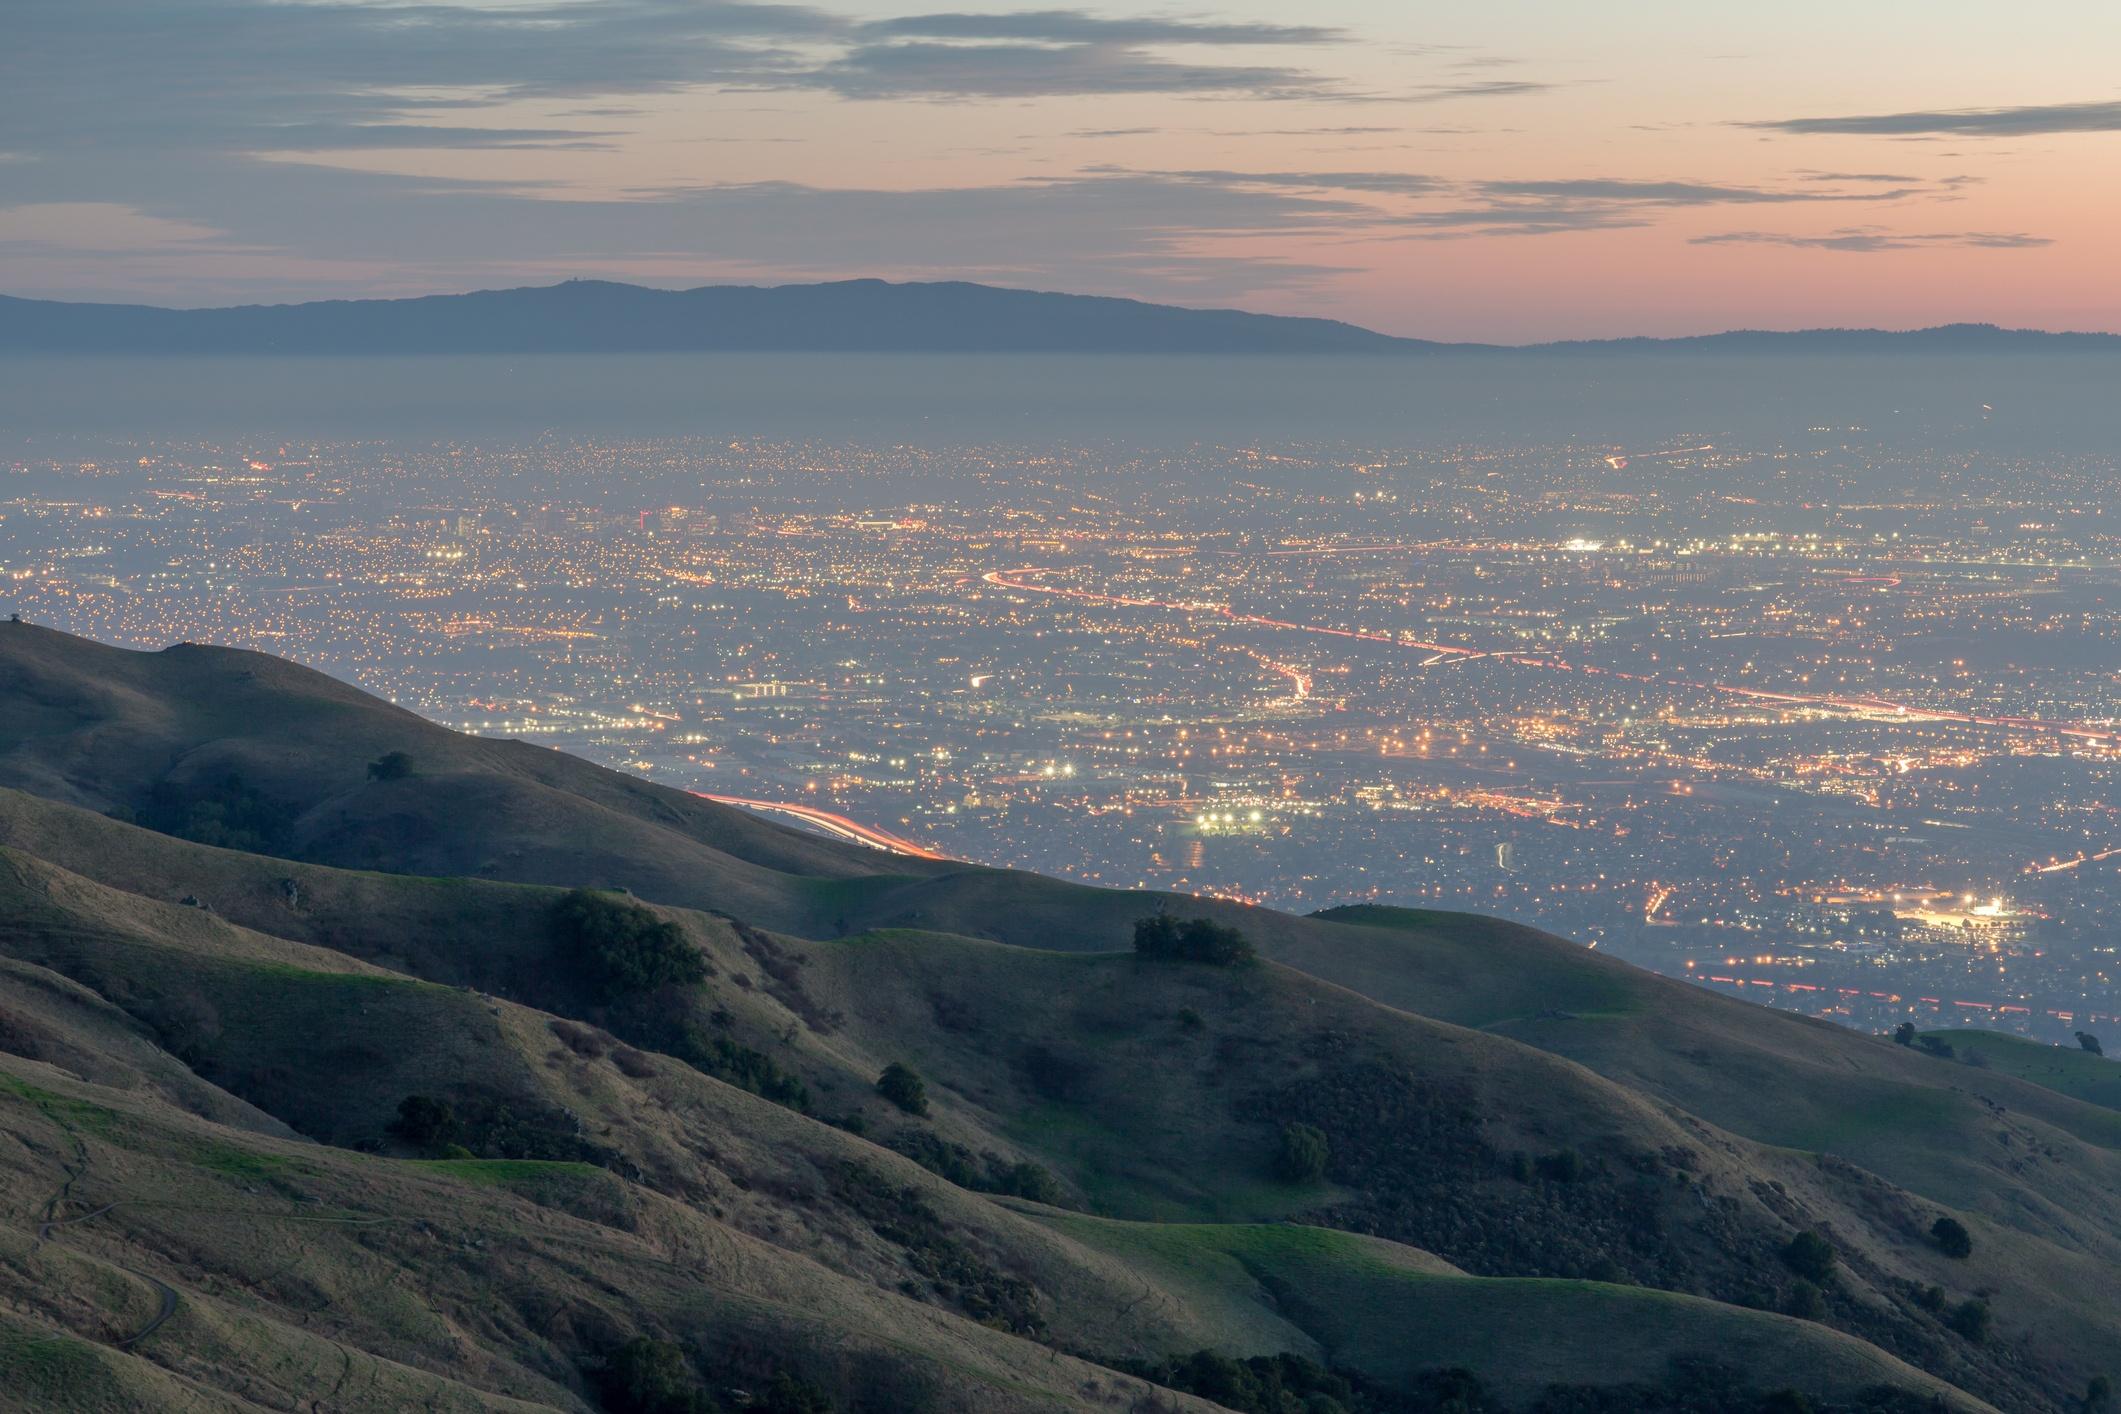 Fremont, California